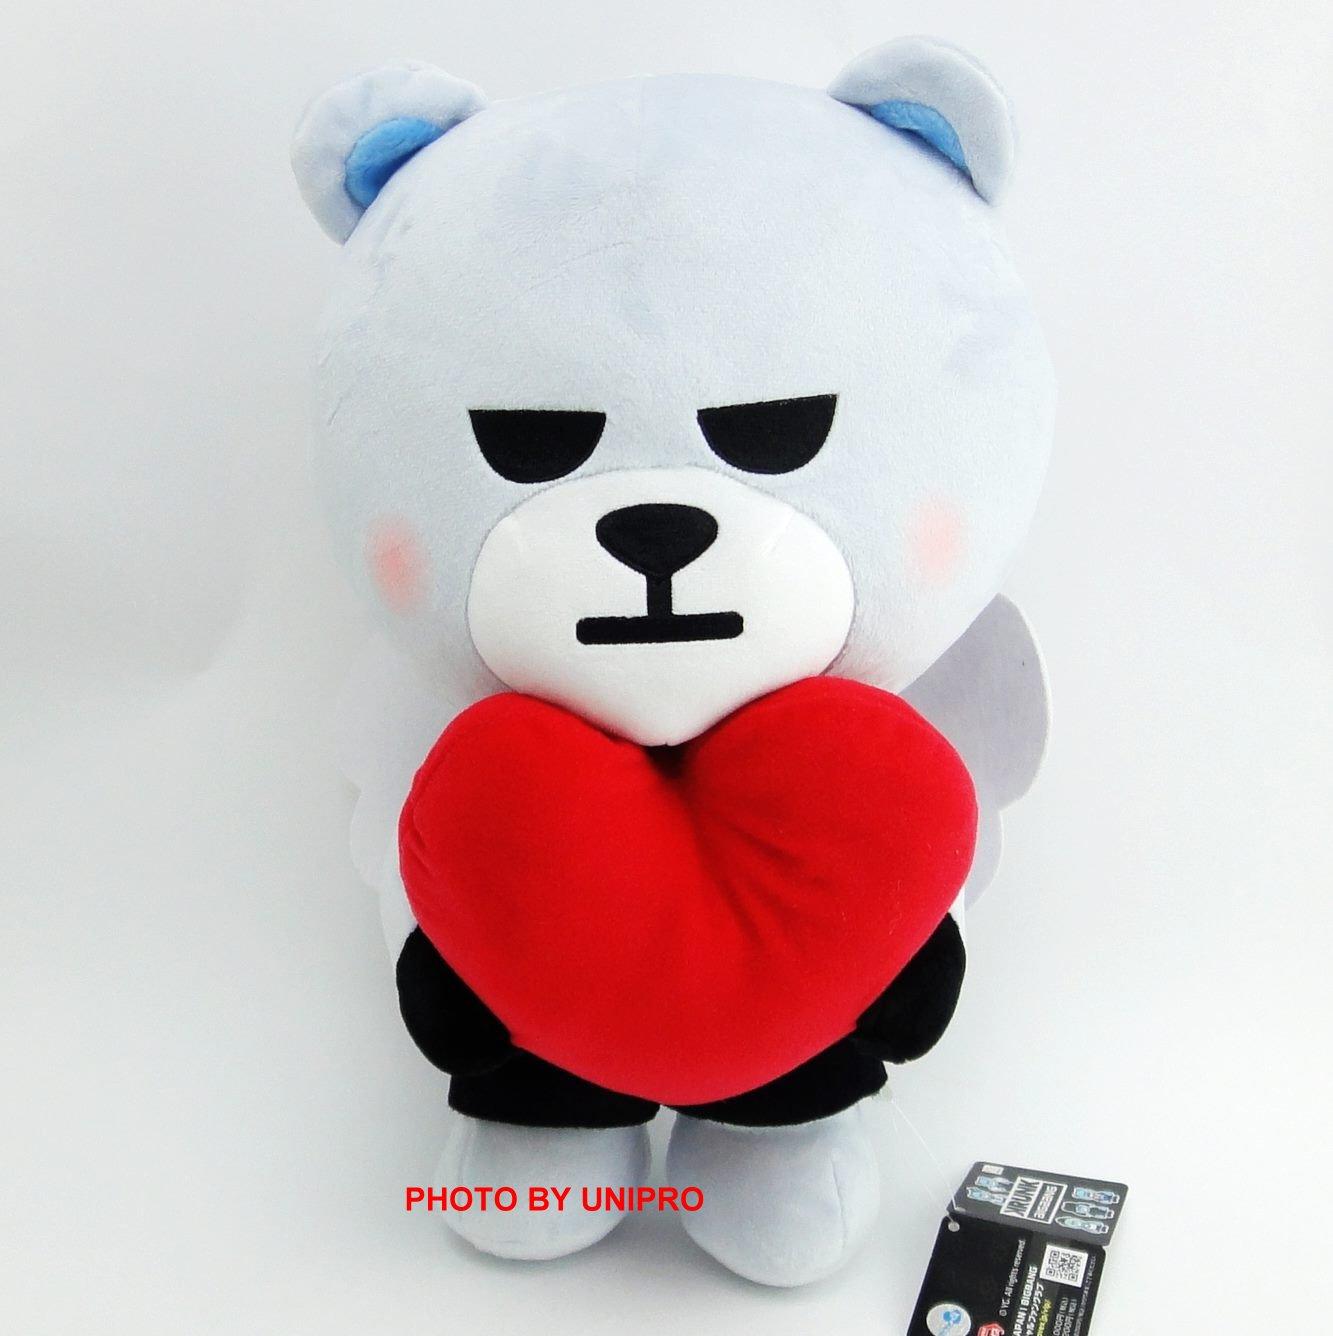 【UNIPRO】KRUNK BIGBANG BIG 單售 D-LITE 絨毛 娃娃 禮物 情人節